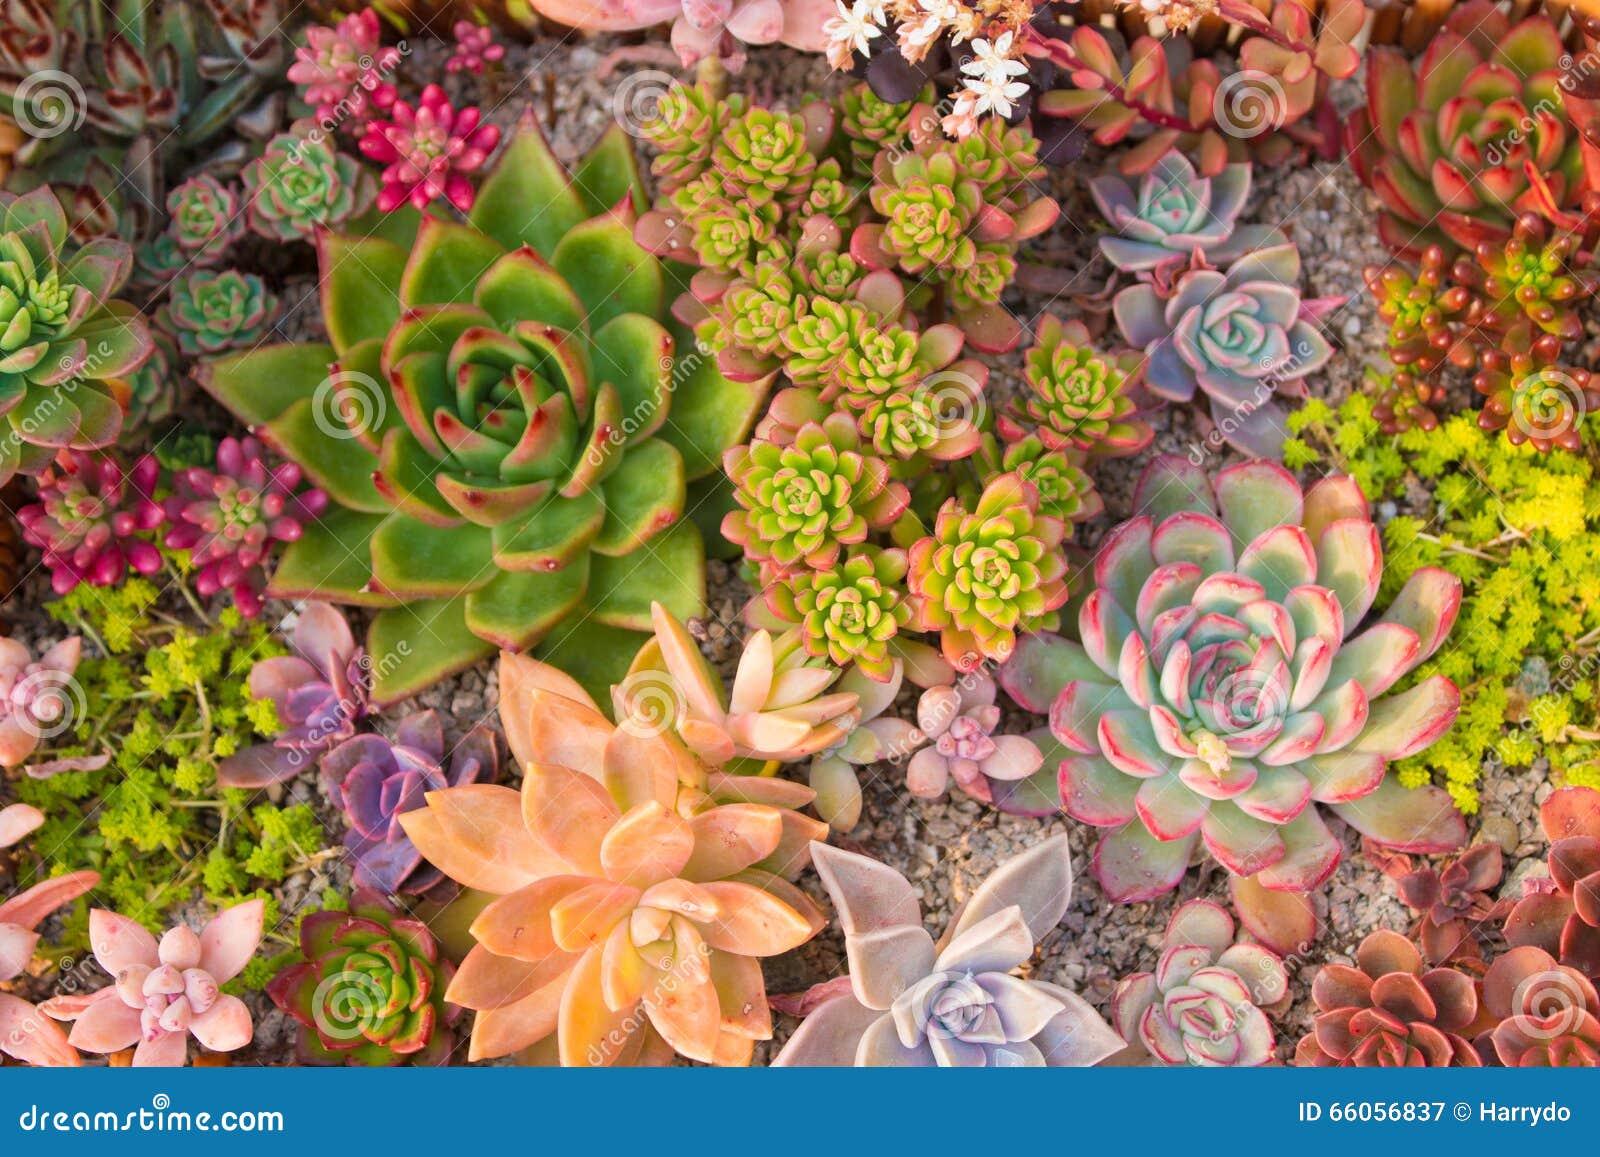 Many beautiful succulents